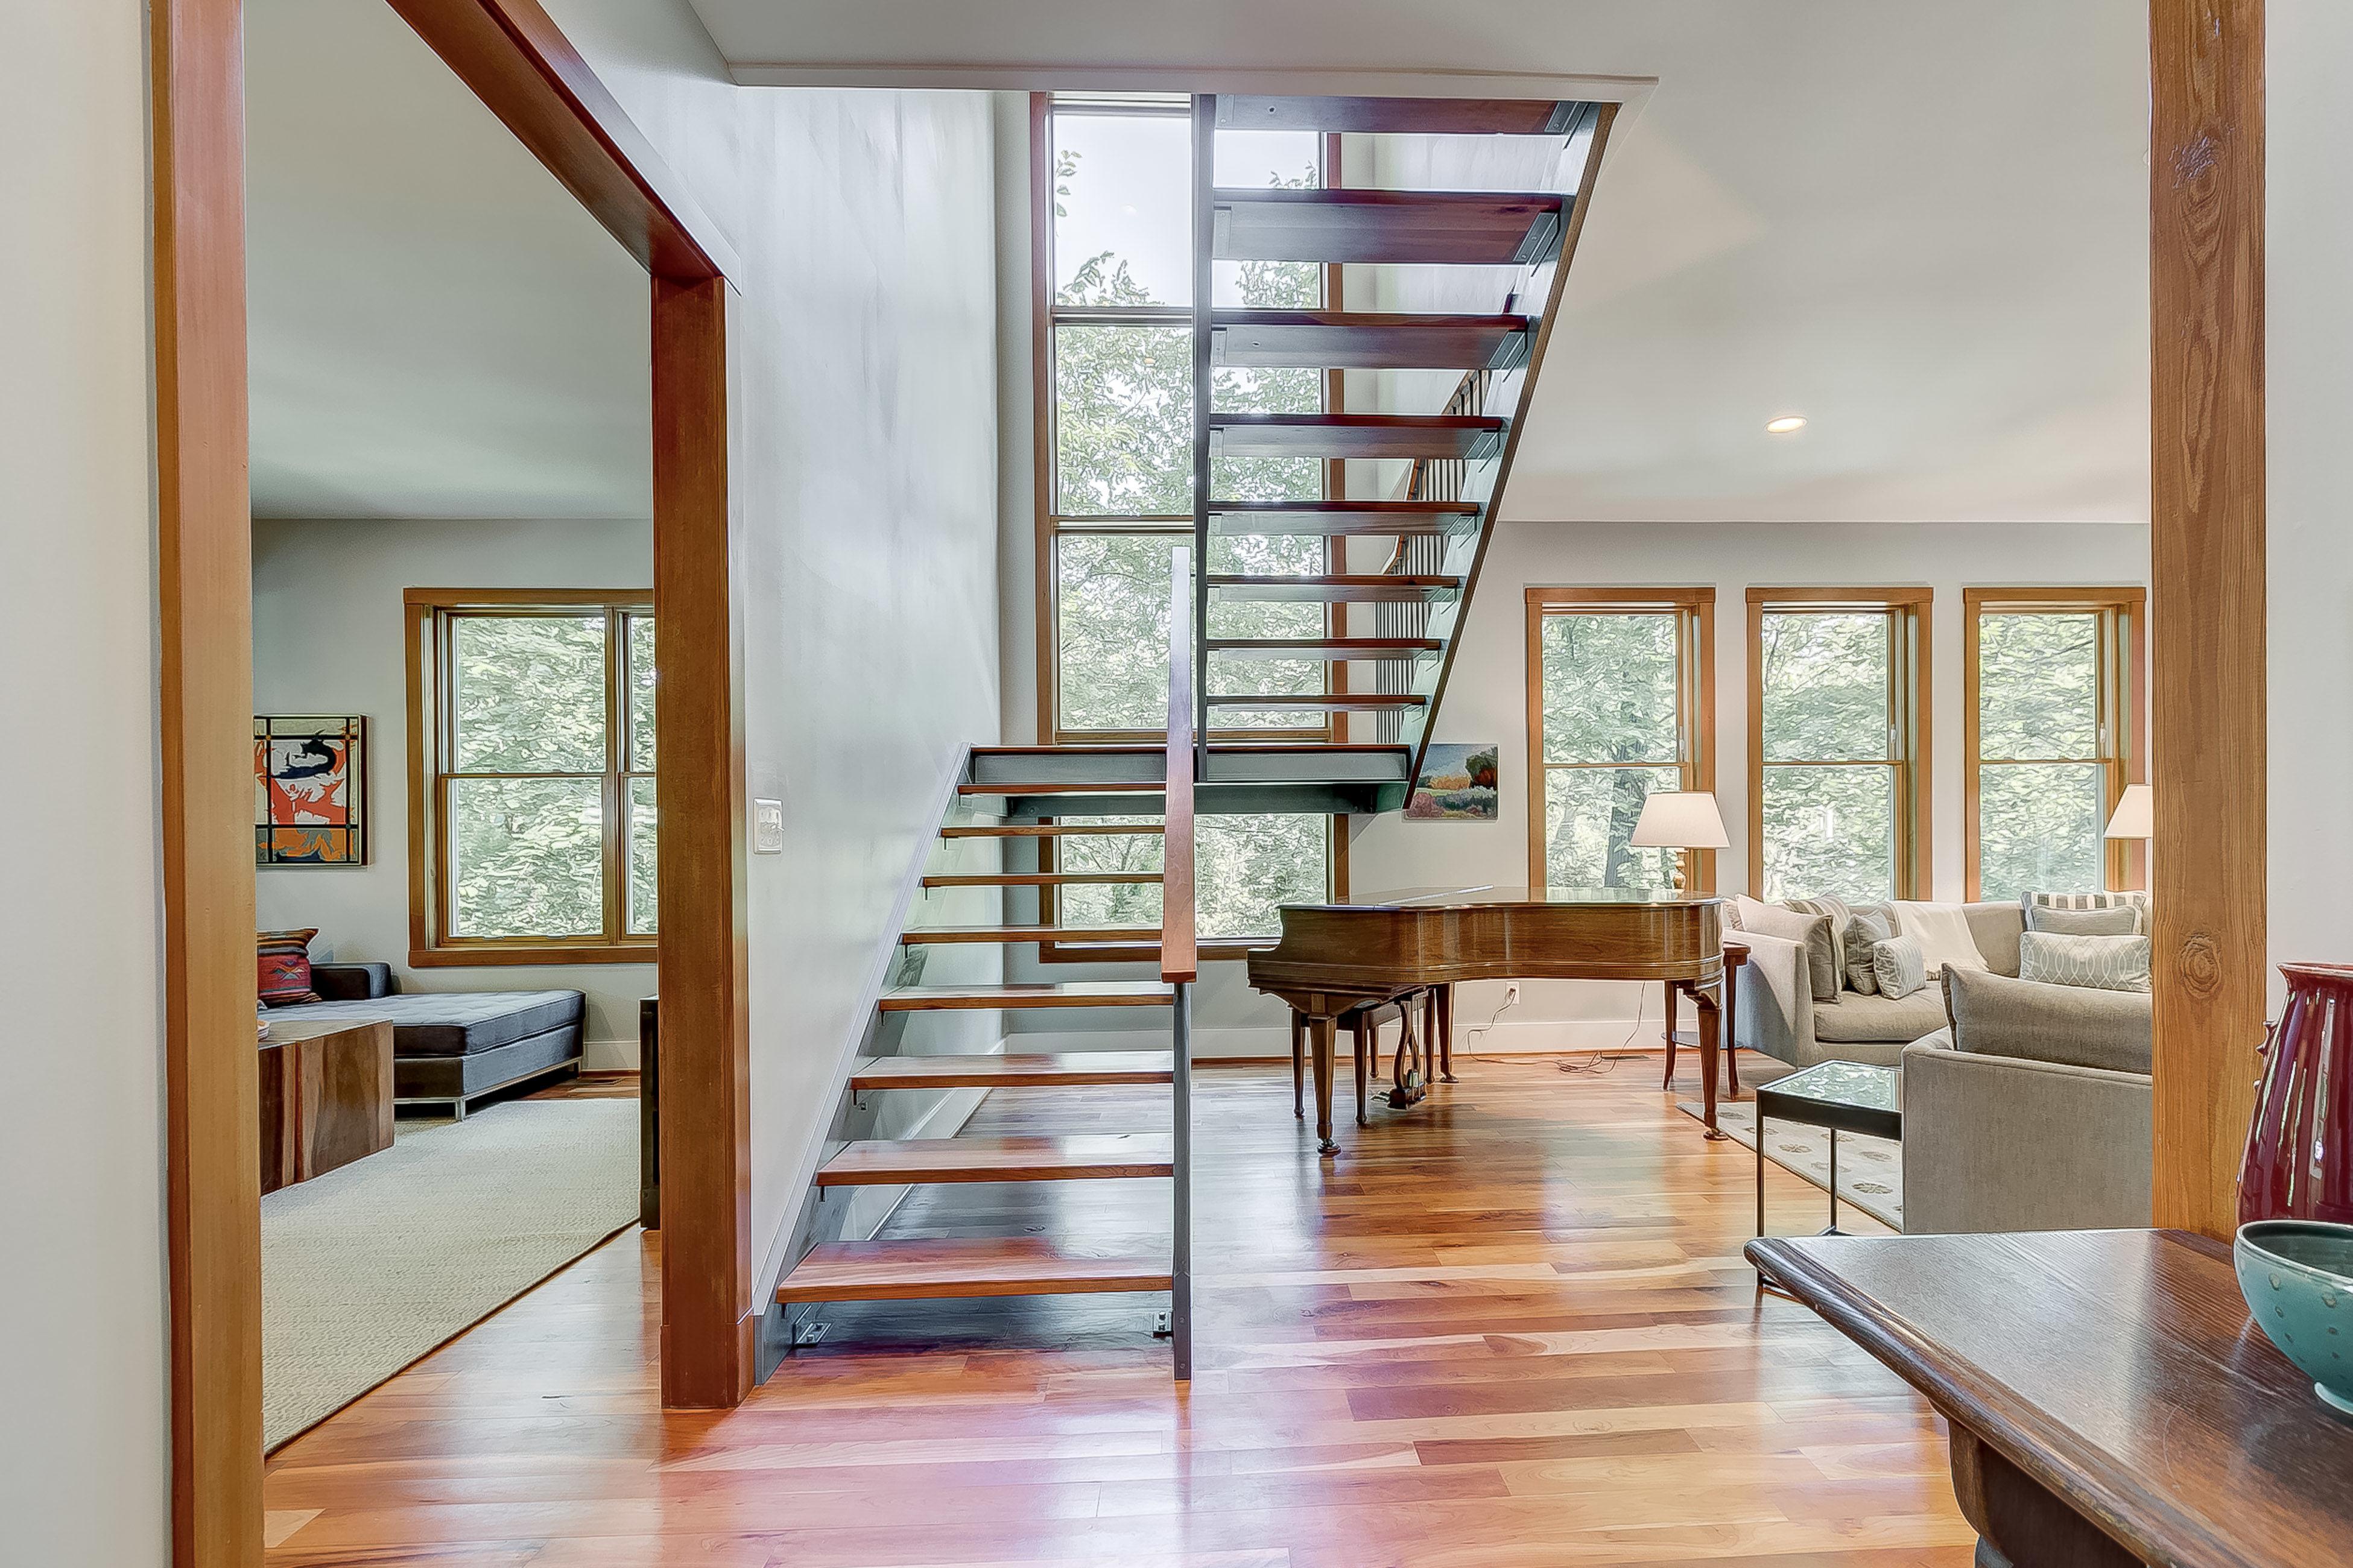 open the door + look straight through the main stair to sunlight + treetops